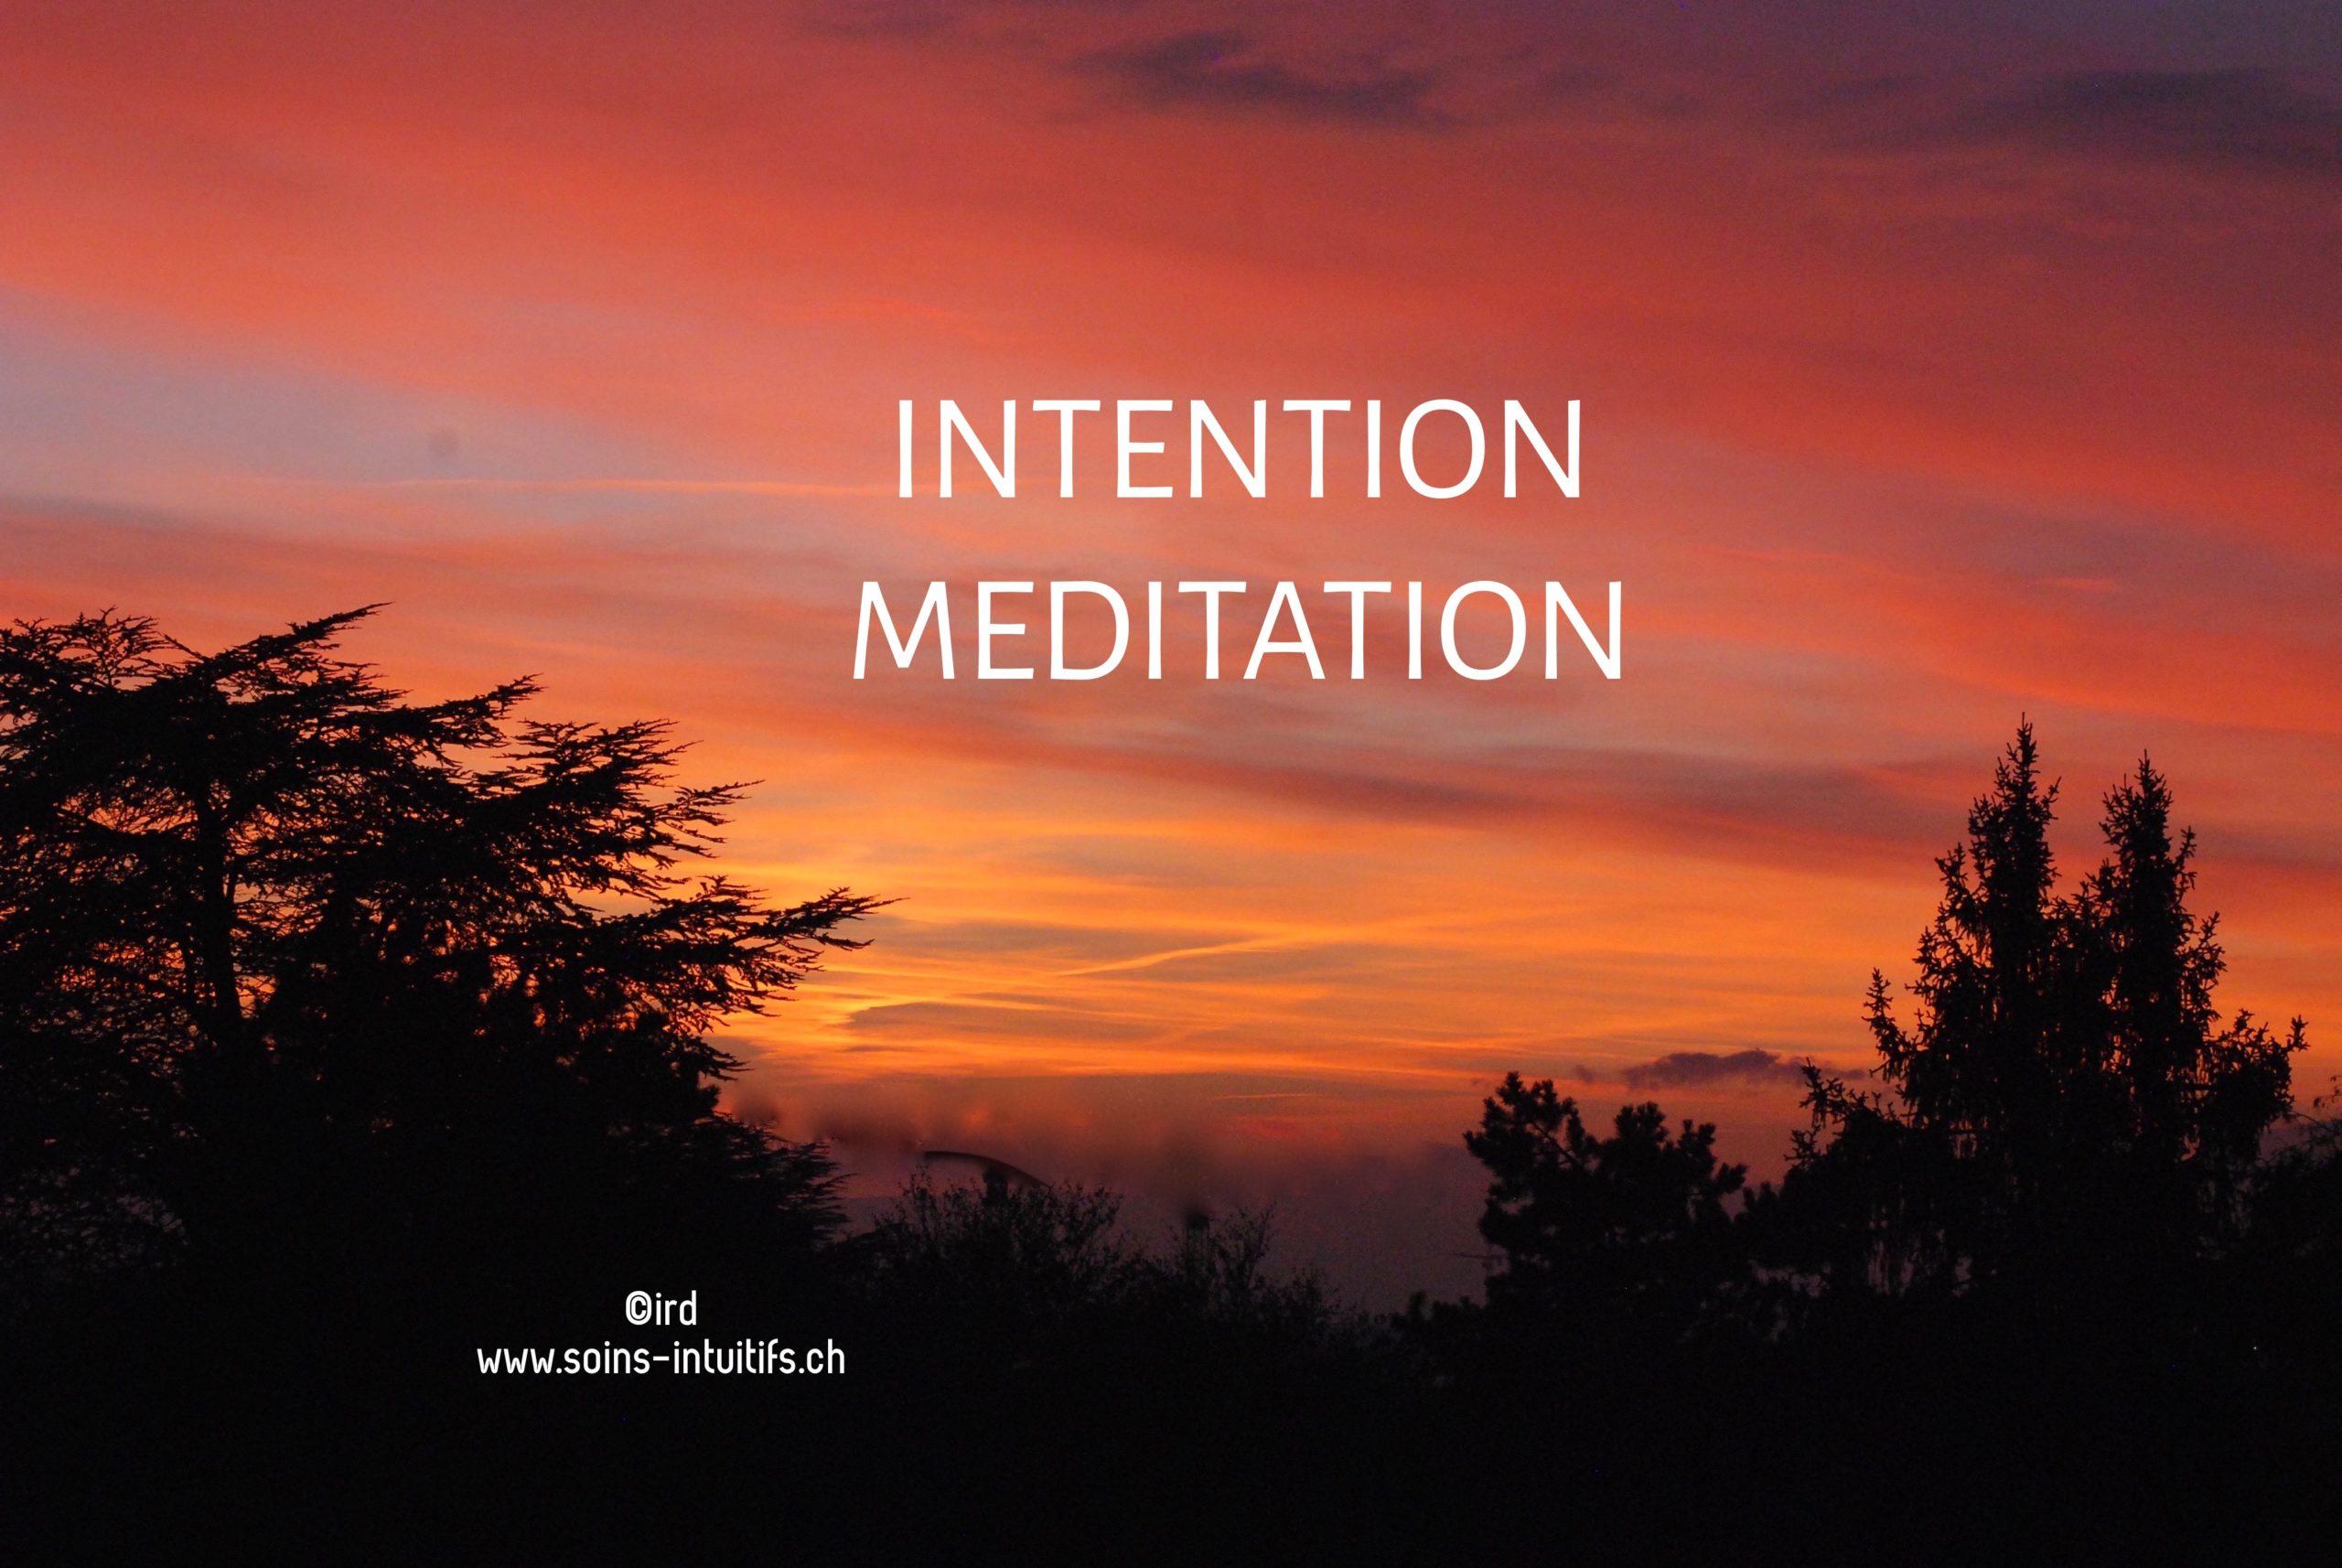 Atelier Méditation - Intention  : Jeudi 15 novembre 2018